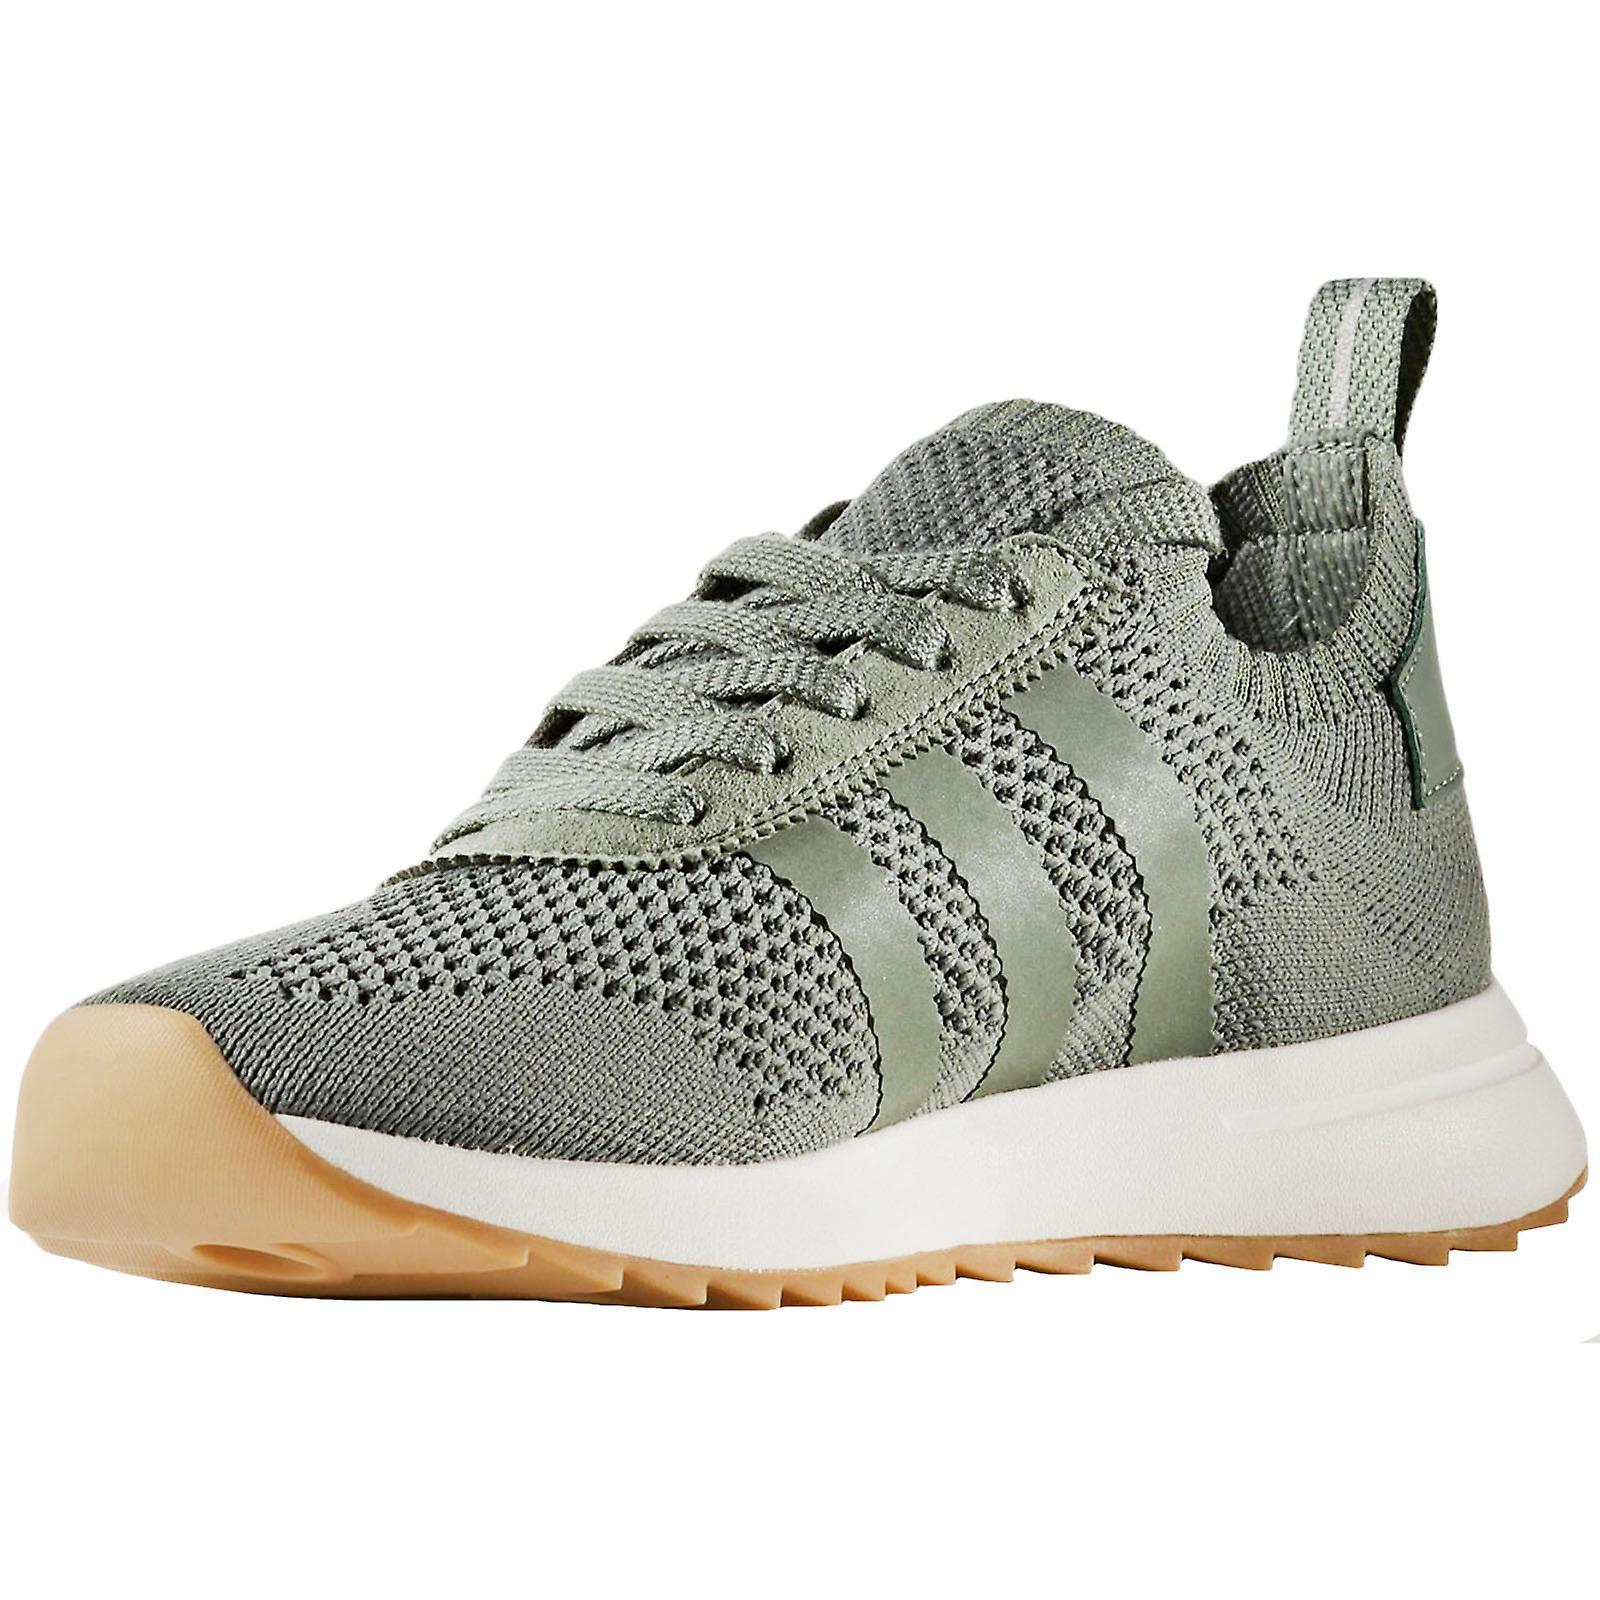 Adidas Originals Womens FLB W PK Lace Up Sneakers Trainer Freizeitschuhe Green